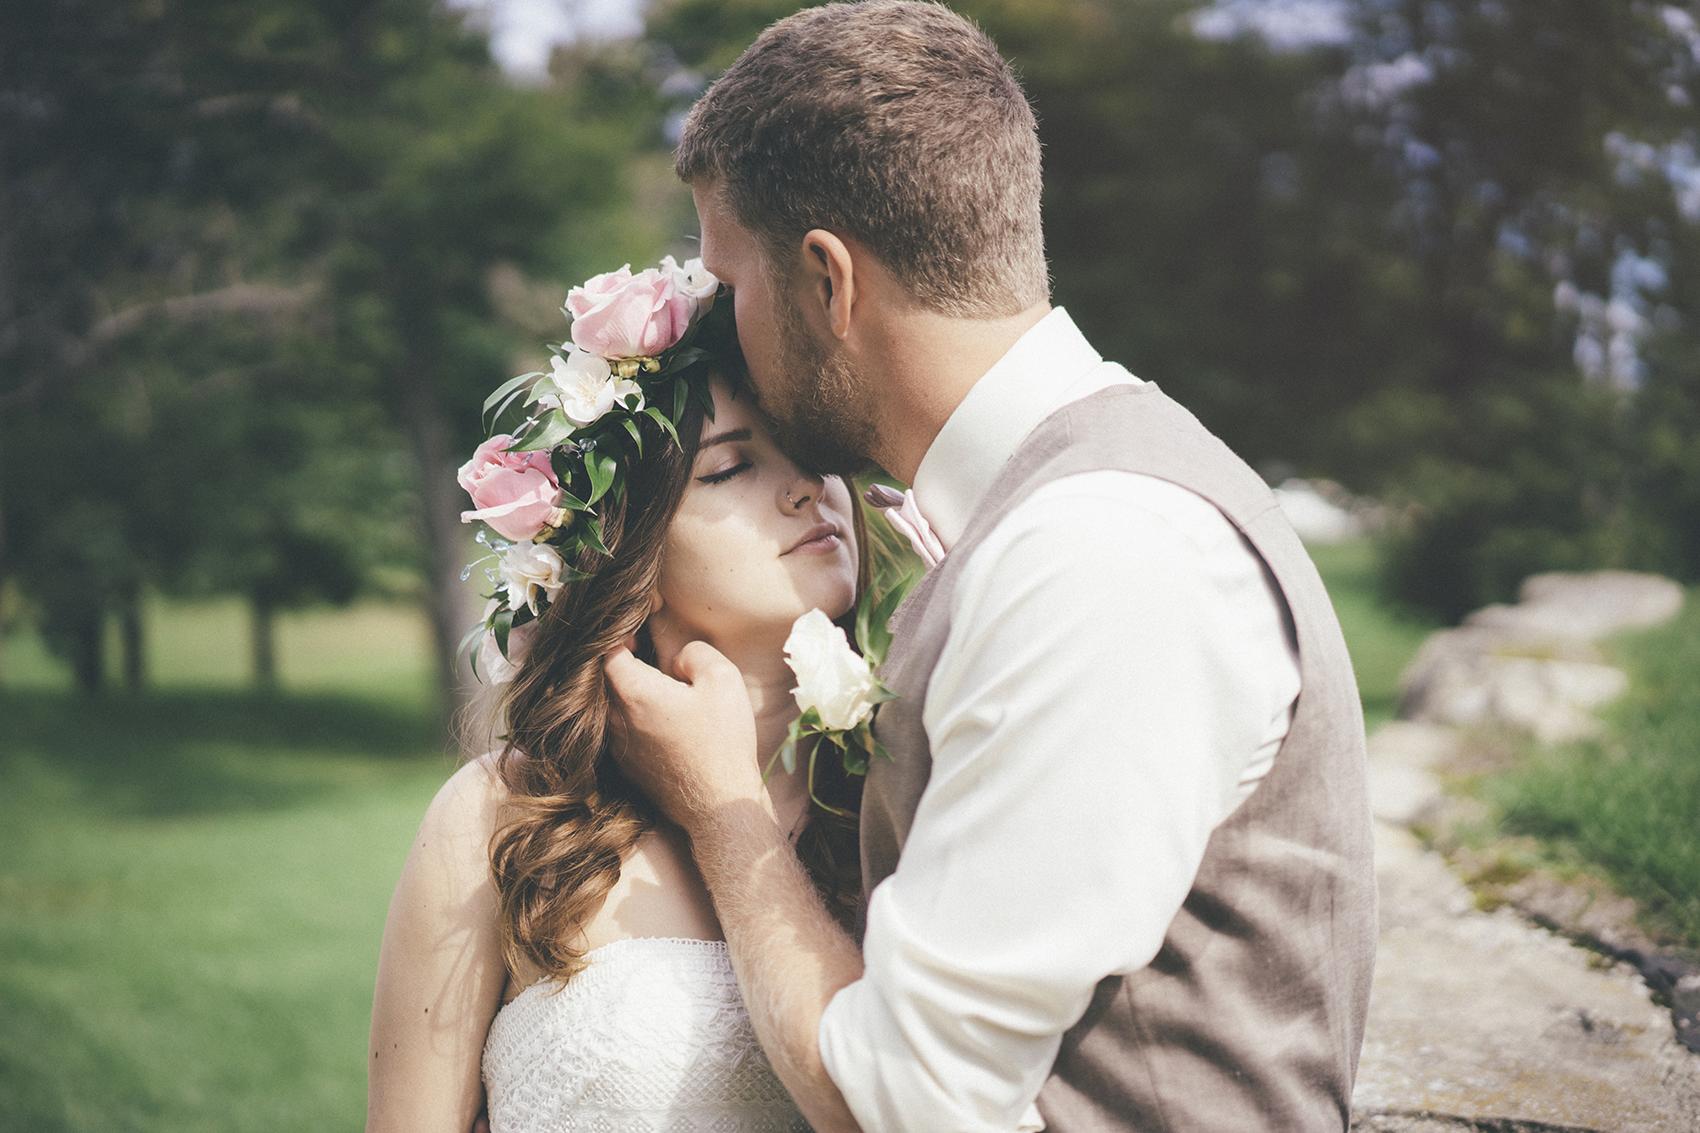 Mike_Mendez_Photography_Wedding_Engagements_6